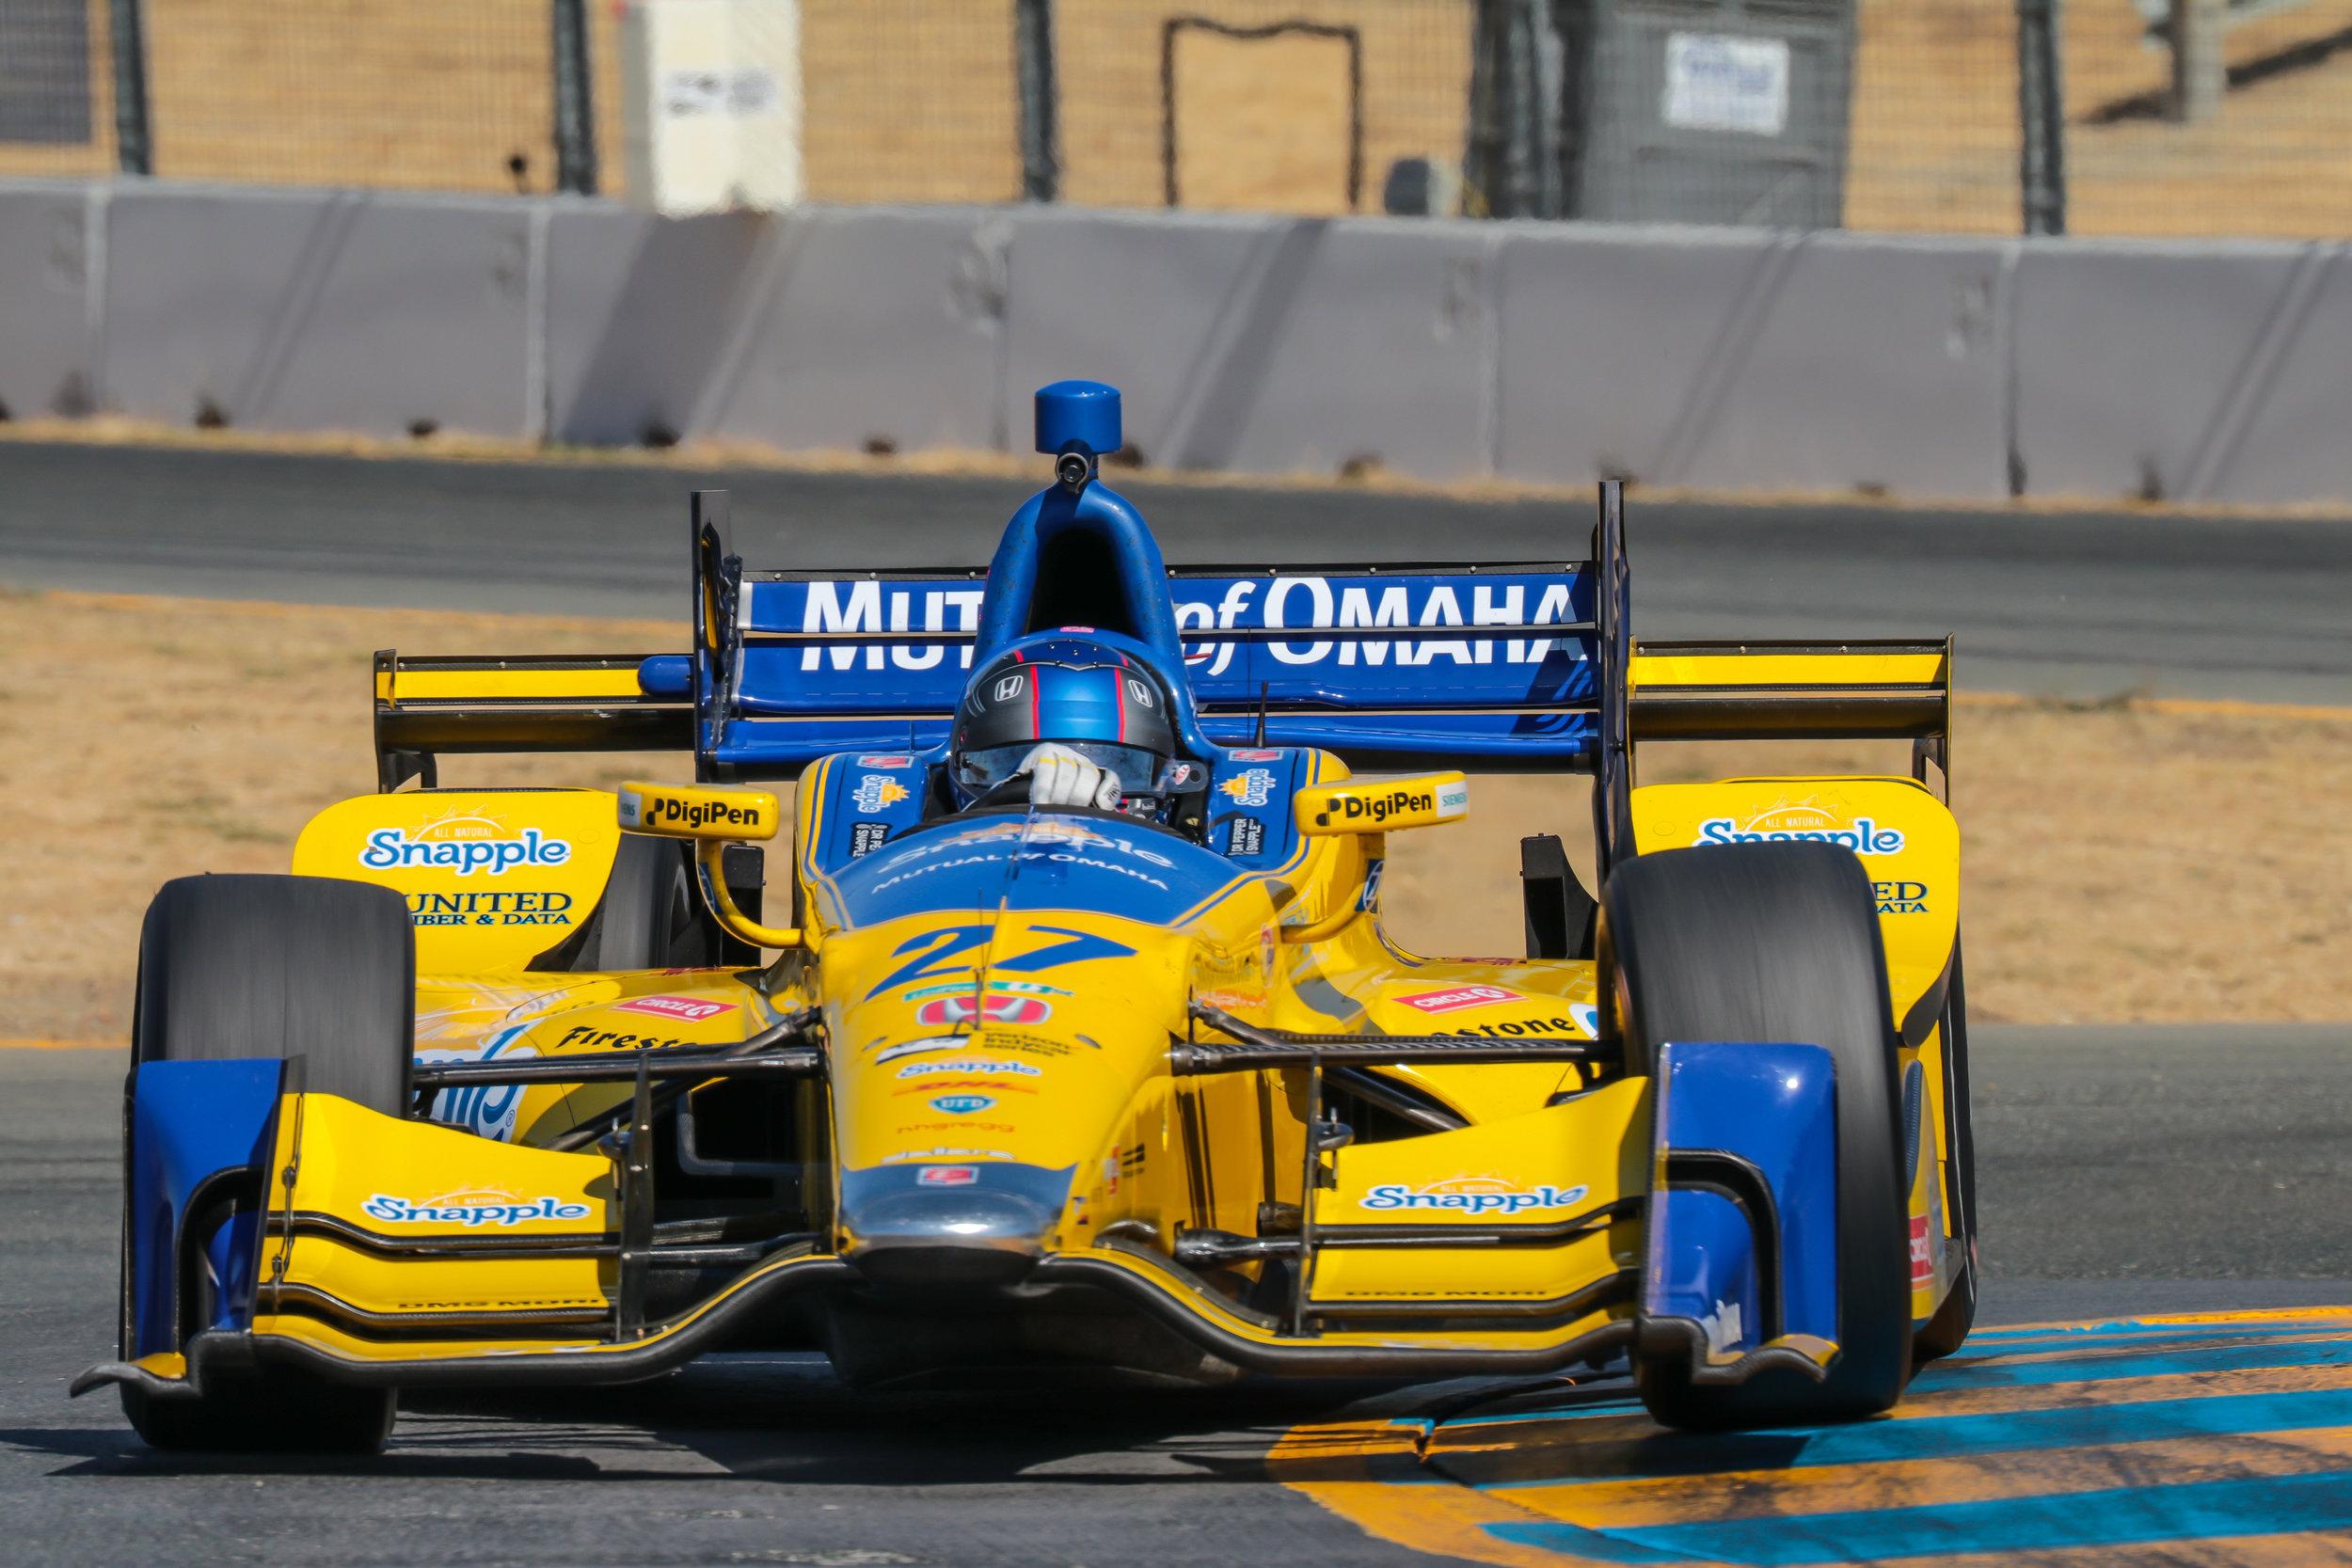 Indy16-2206.jpg